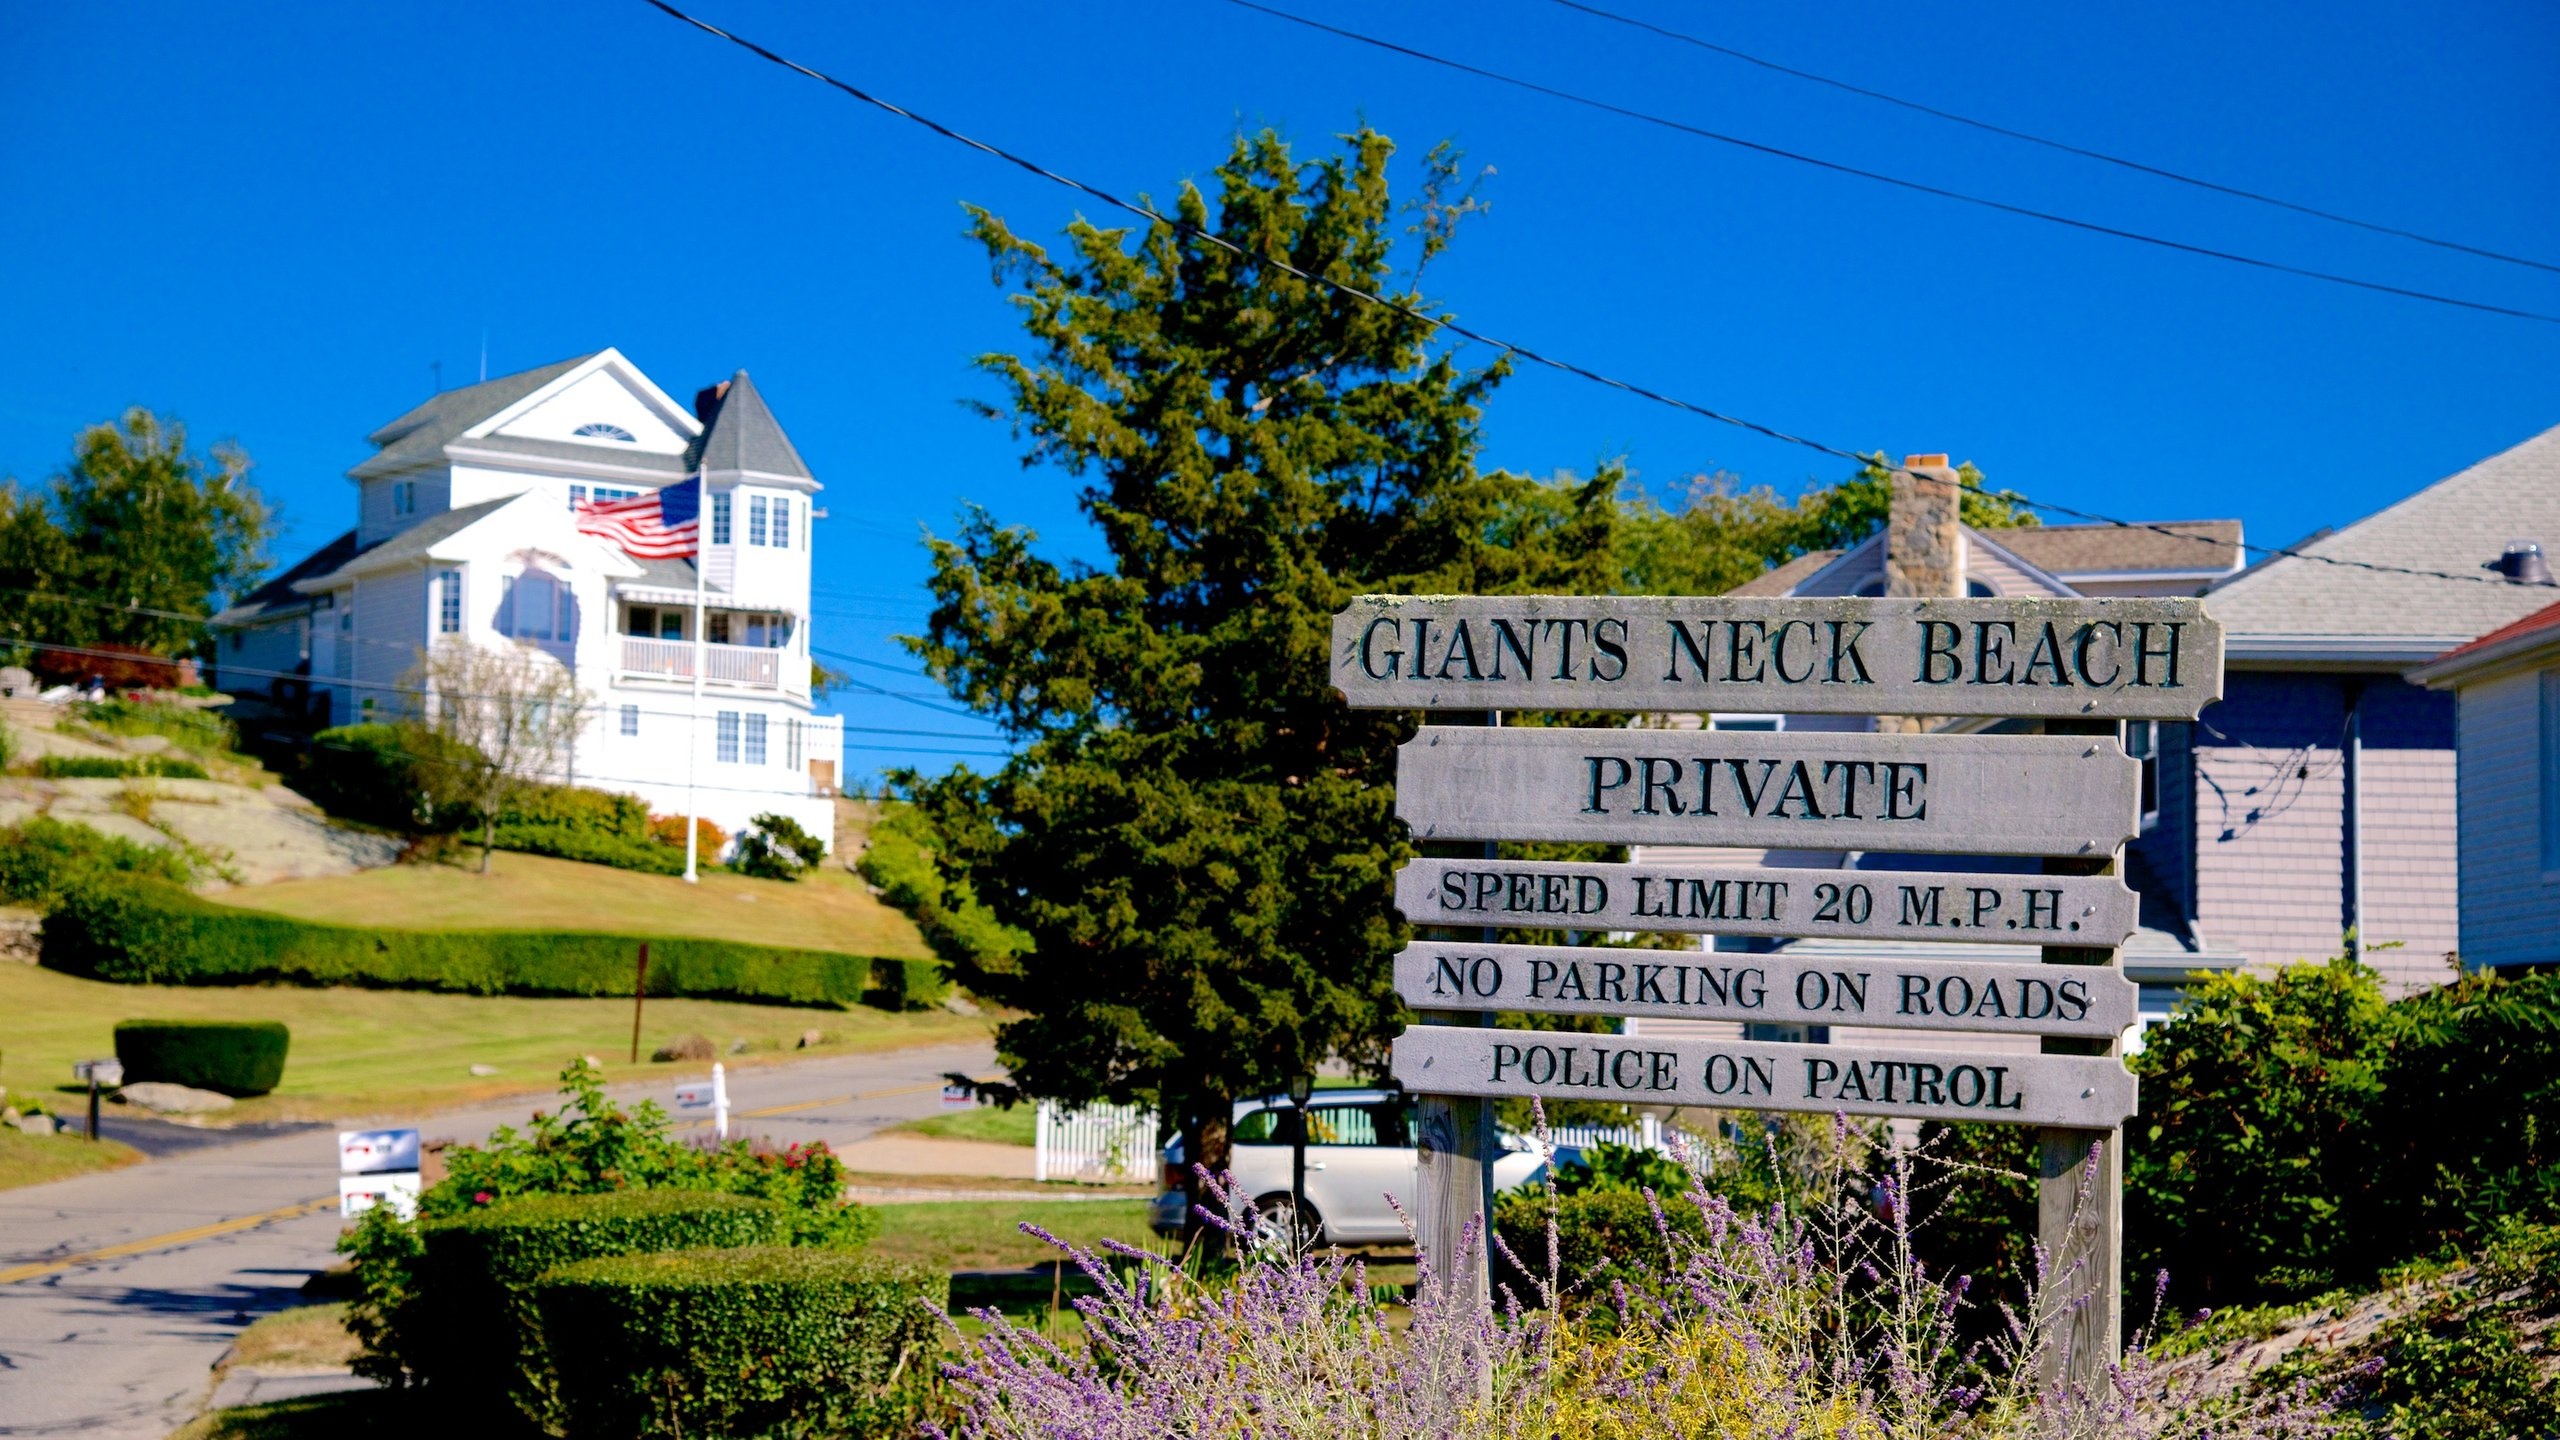 Niantic, Connecticut, United States of America